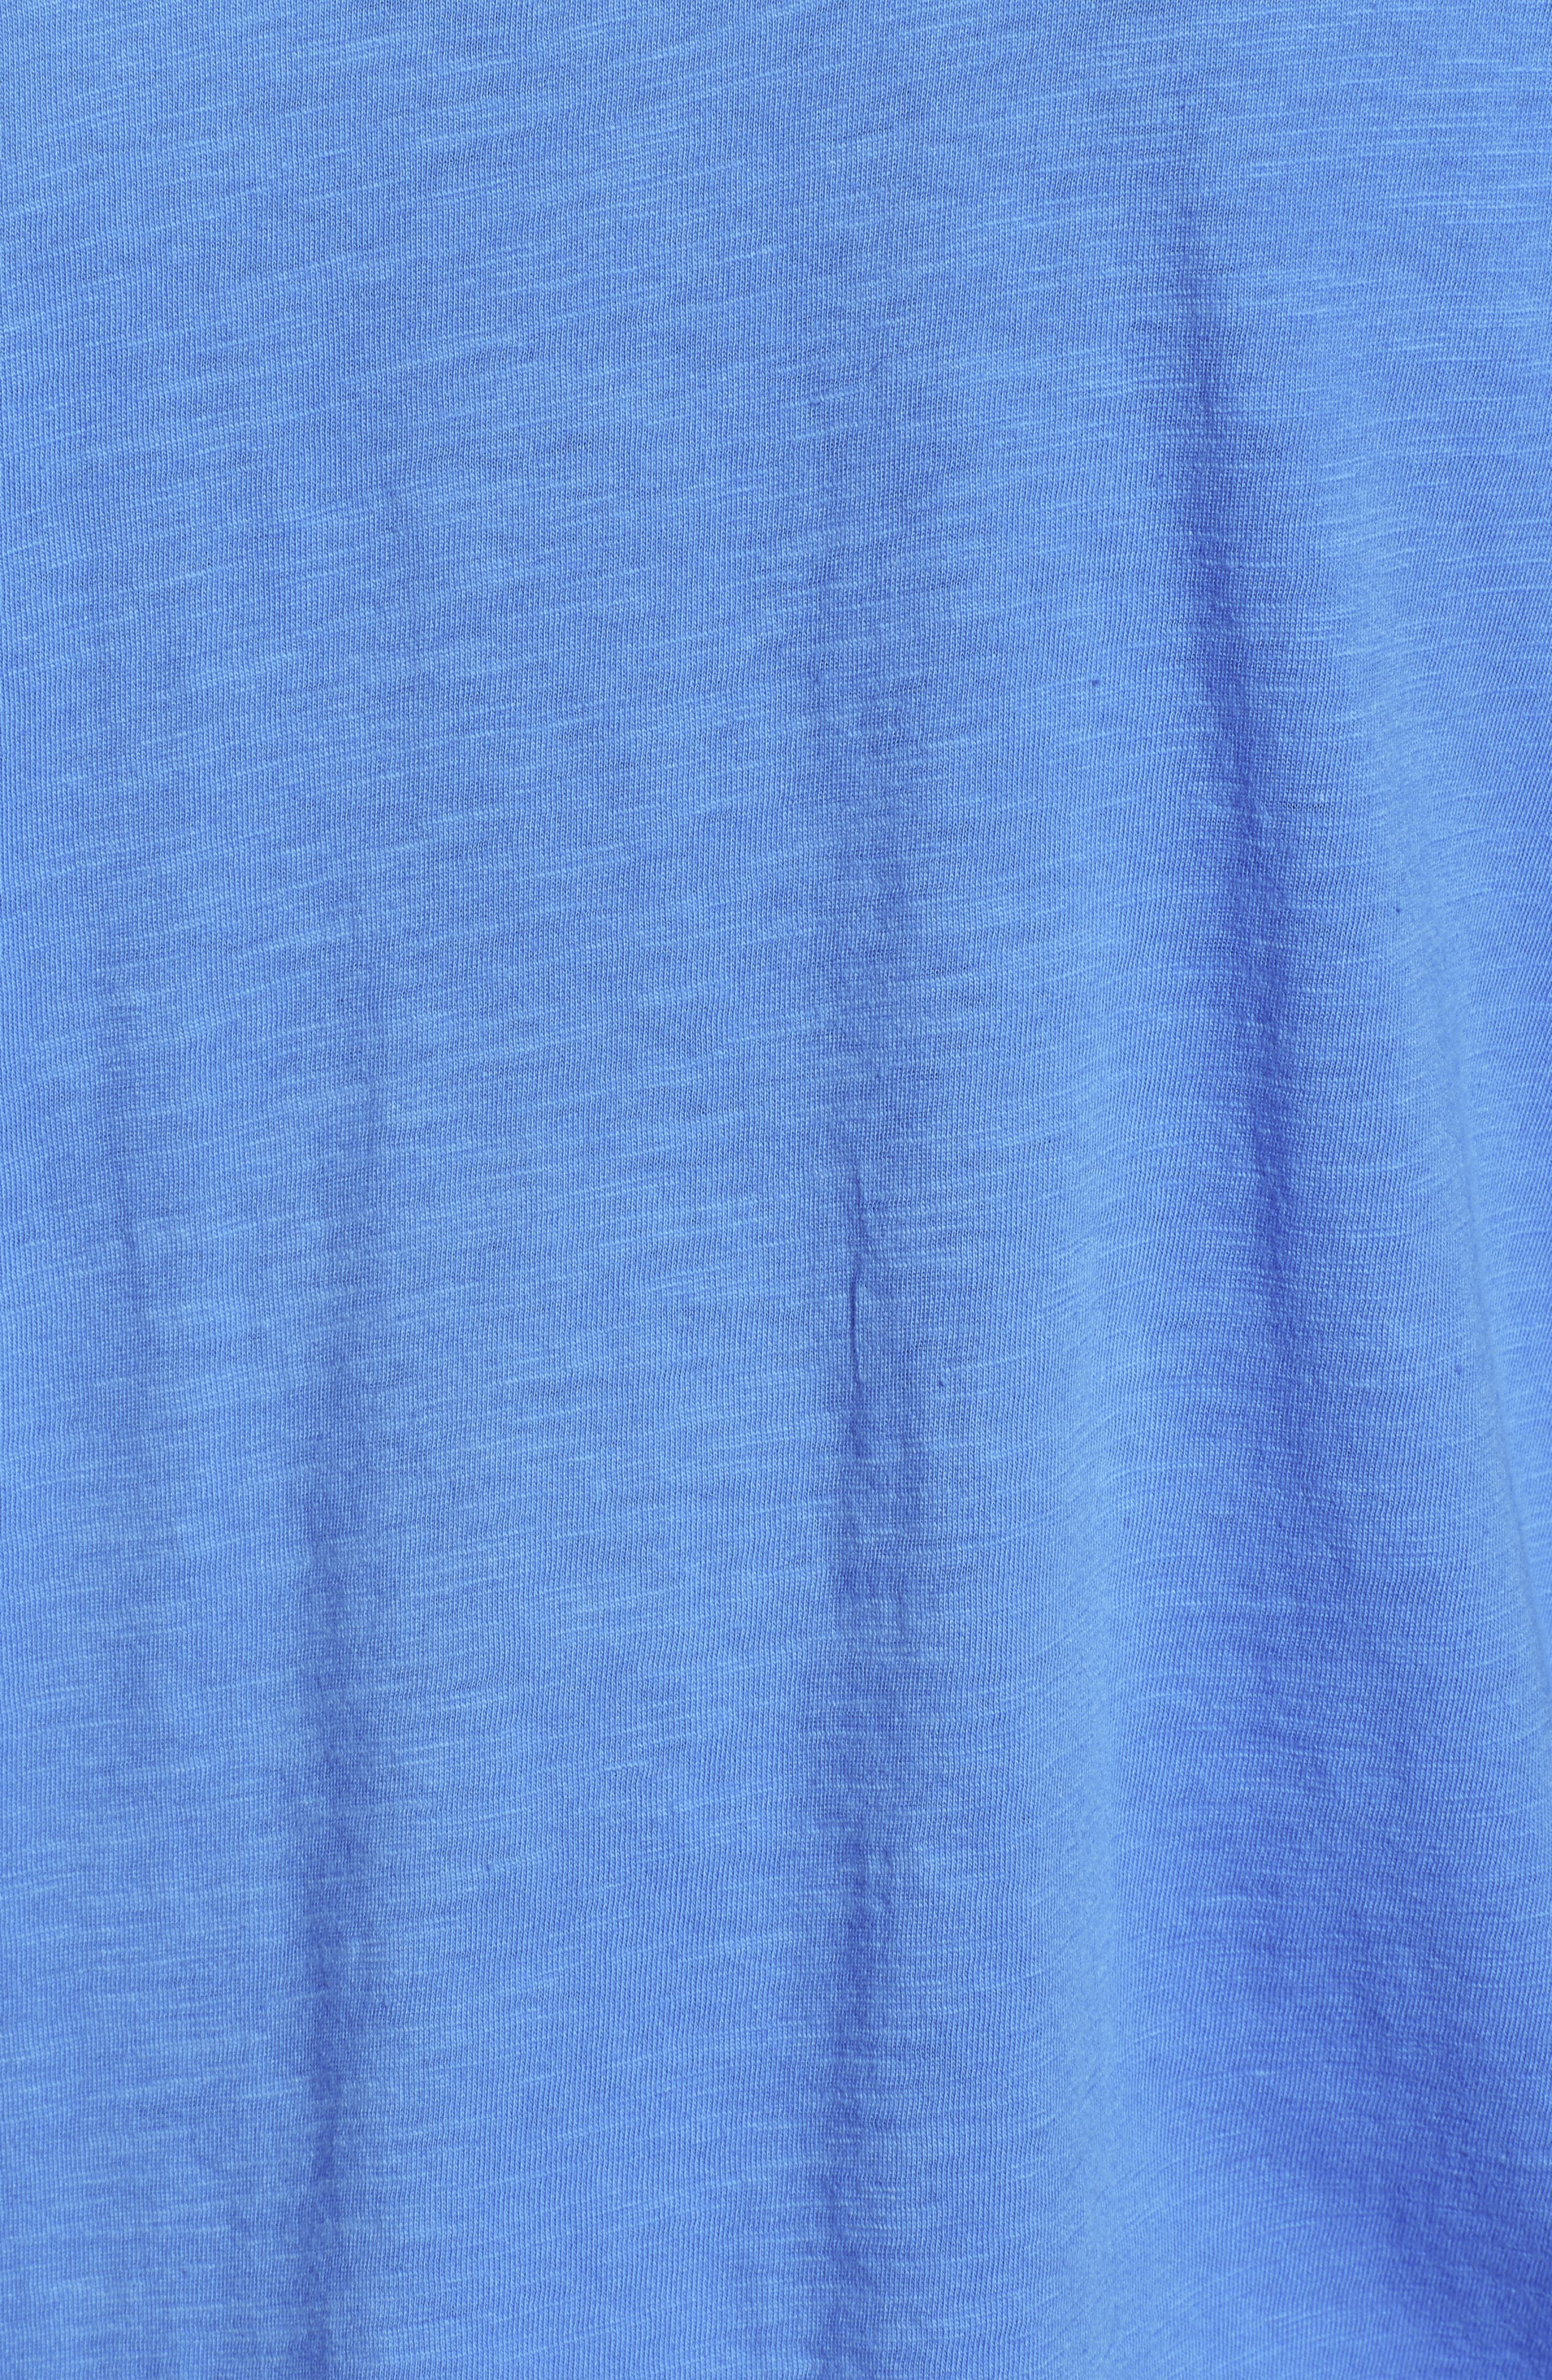 Organic Cotton Knit Top,                             Alternate thumbnail 41, color,